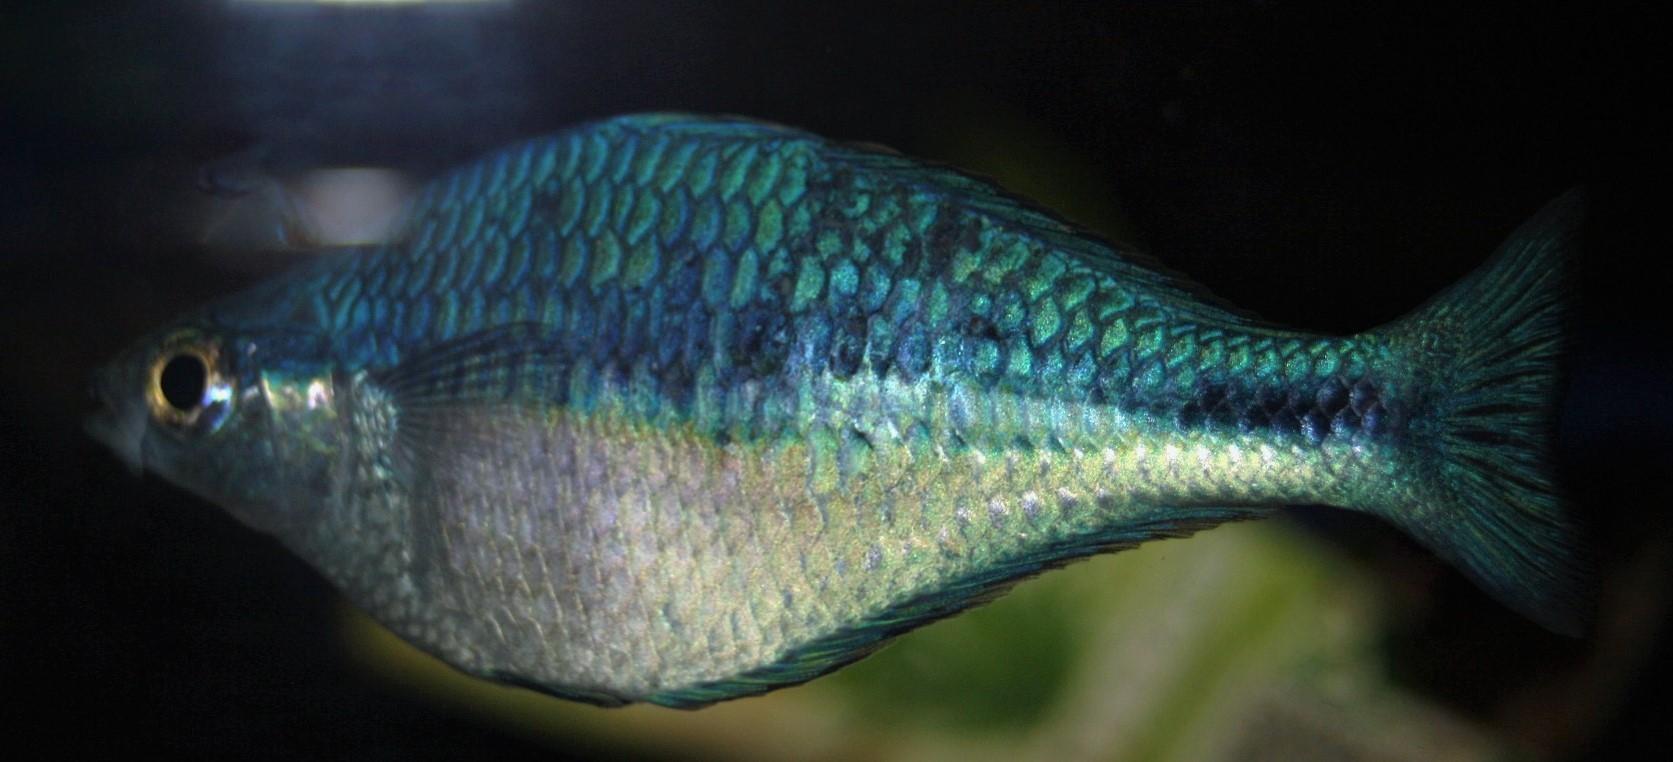 Türkis-Regenbogenfisch (Melanotaenia lacustris)